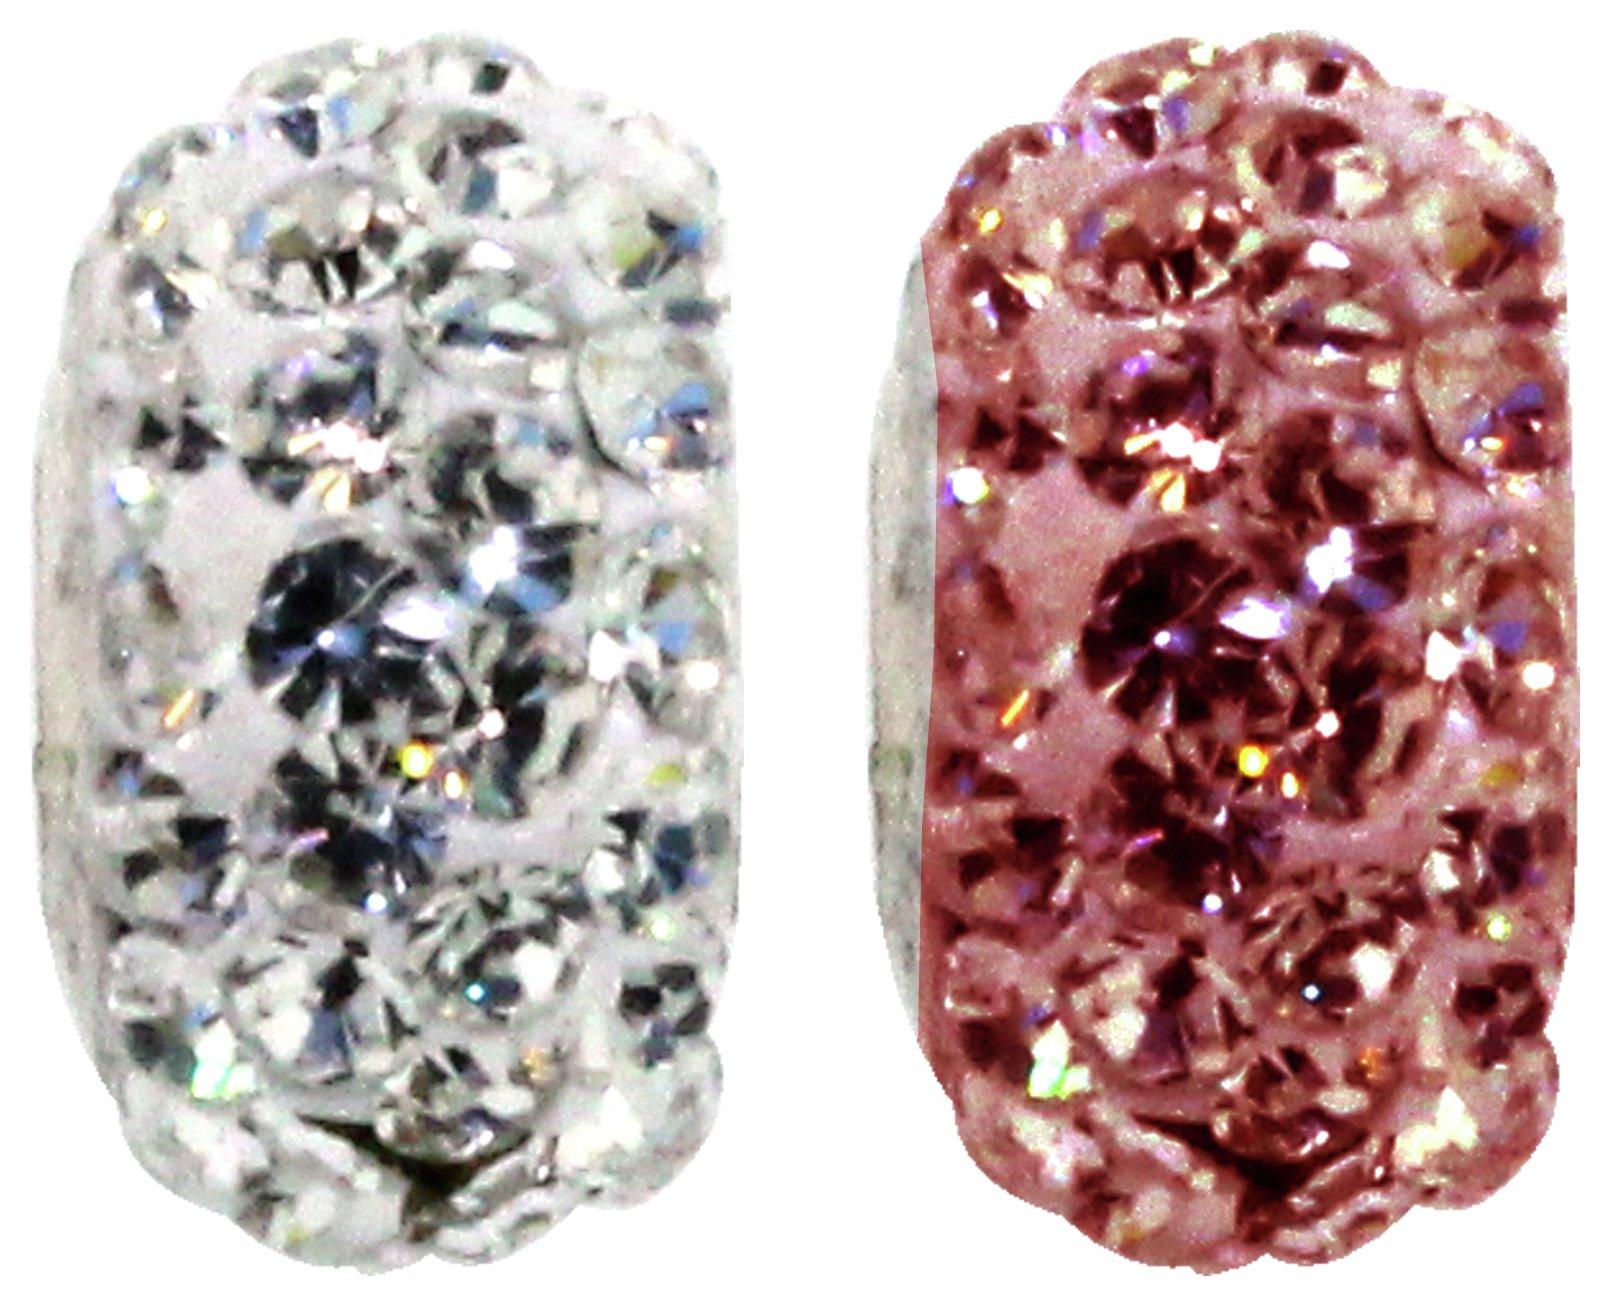 Miss Glitter S.Silver Kids Stone Set Pink/White Washer Beads